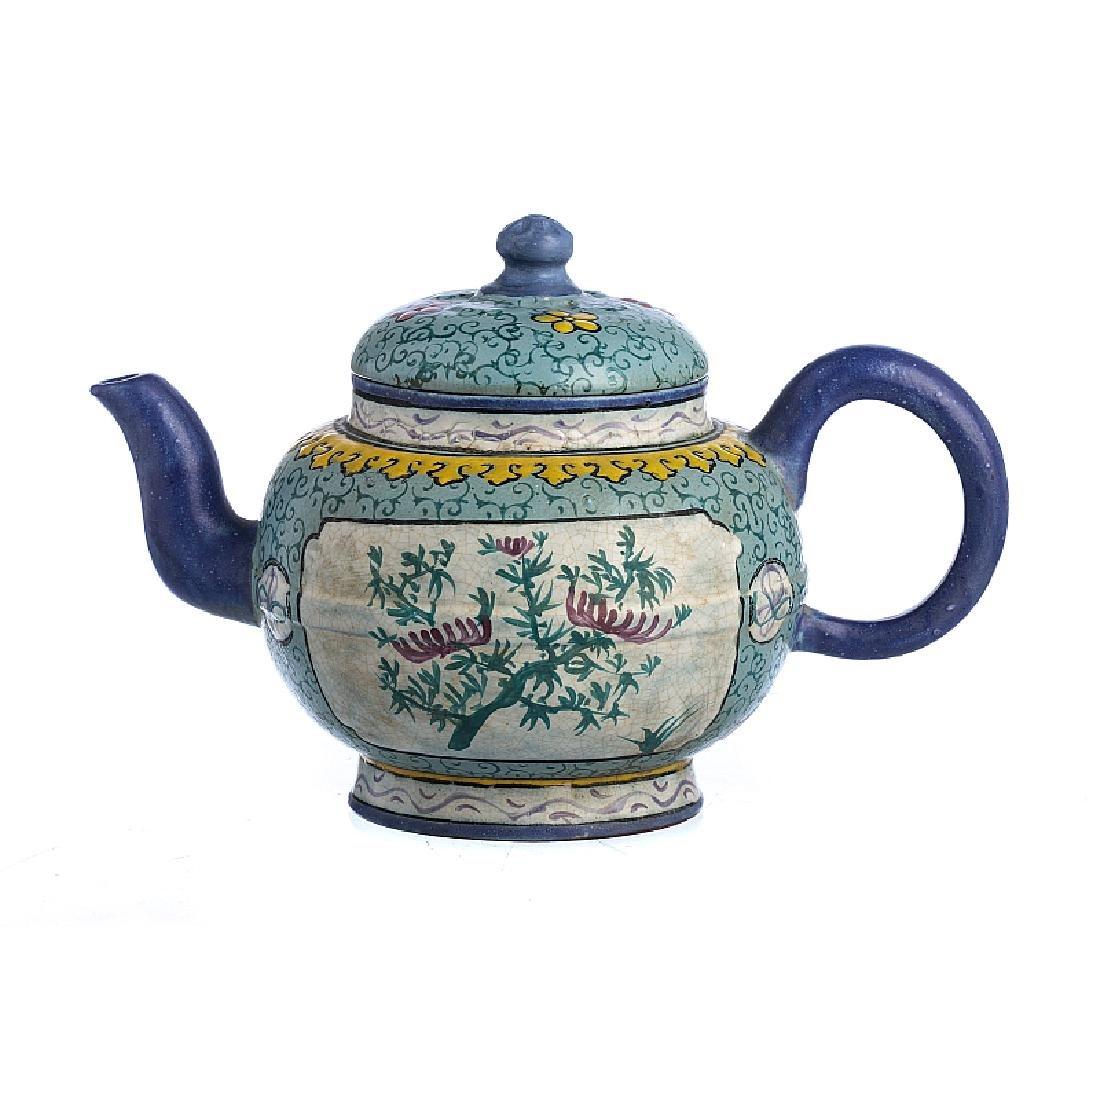 Teapot in Yixing ceramics, Minguo